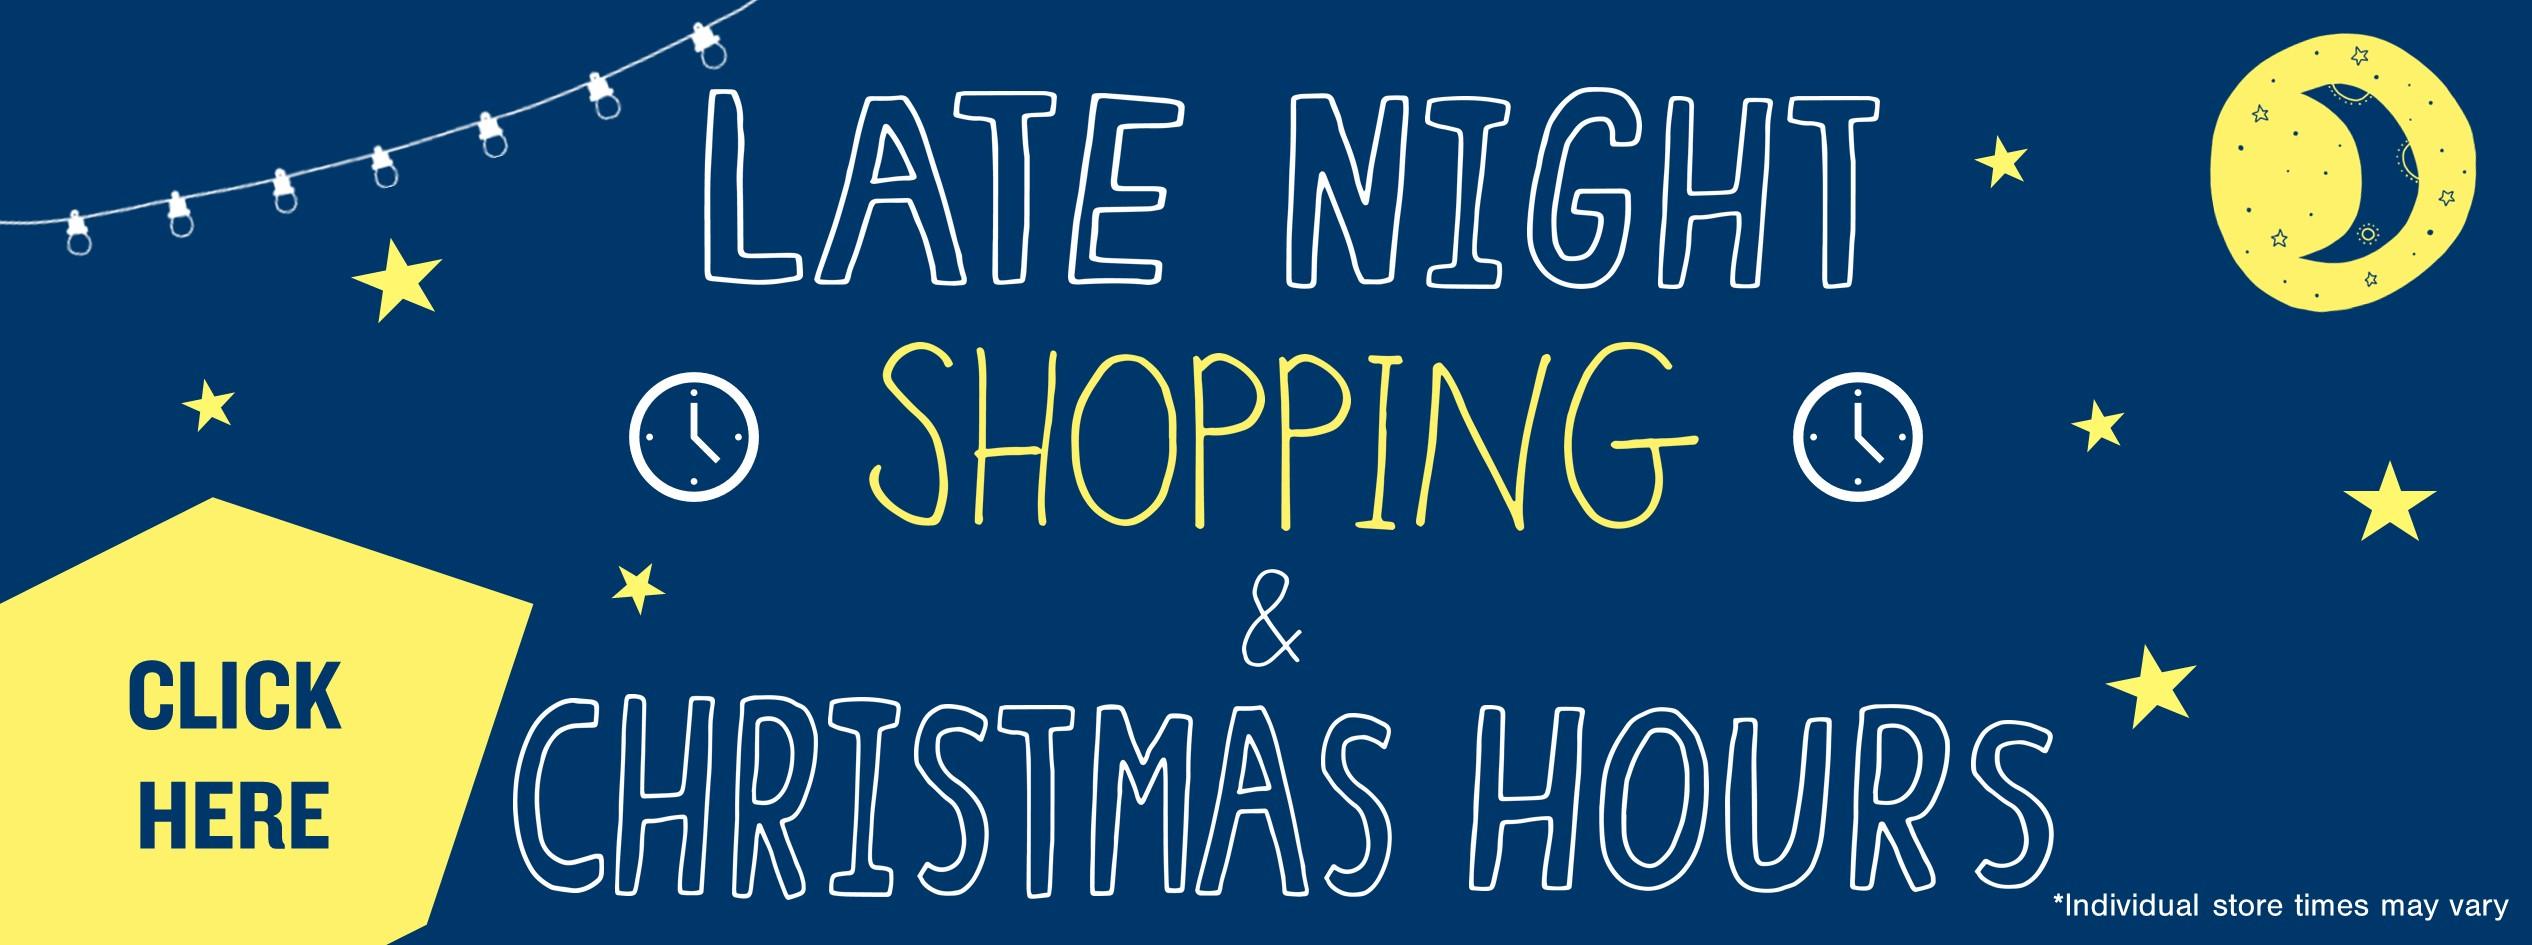 Late Night Shopping Website Banner JPEG